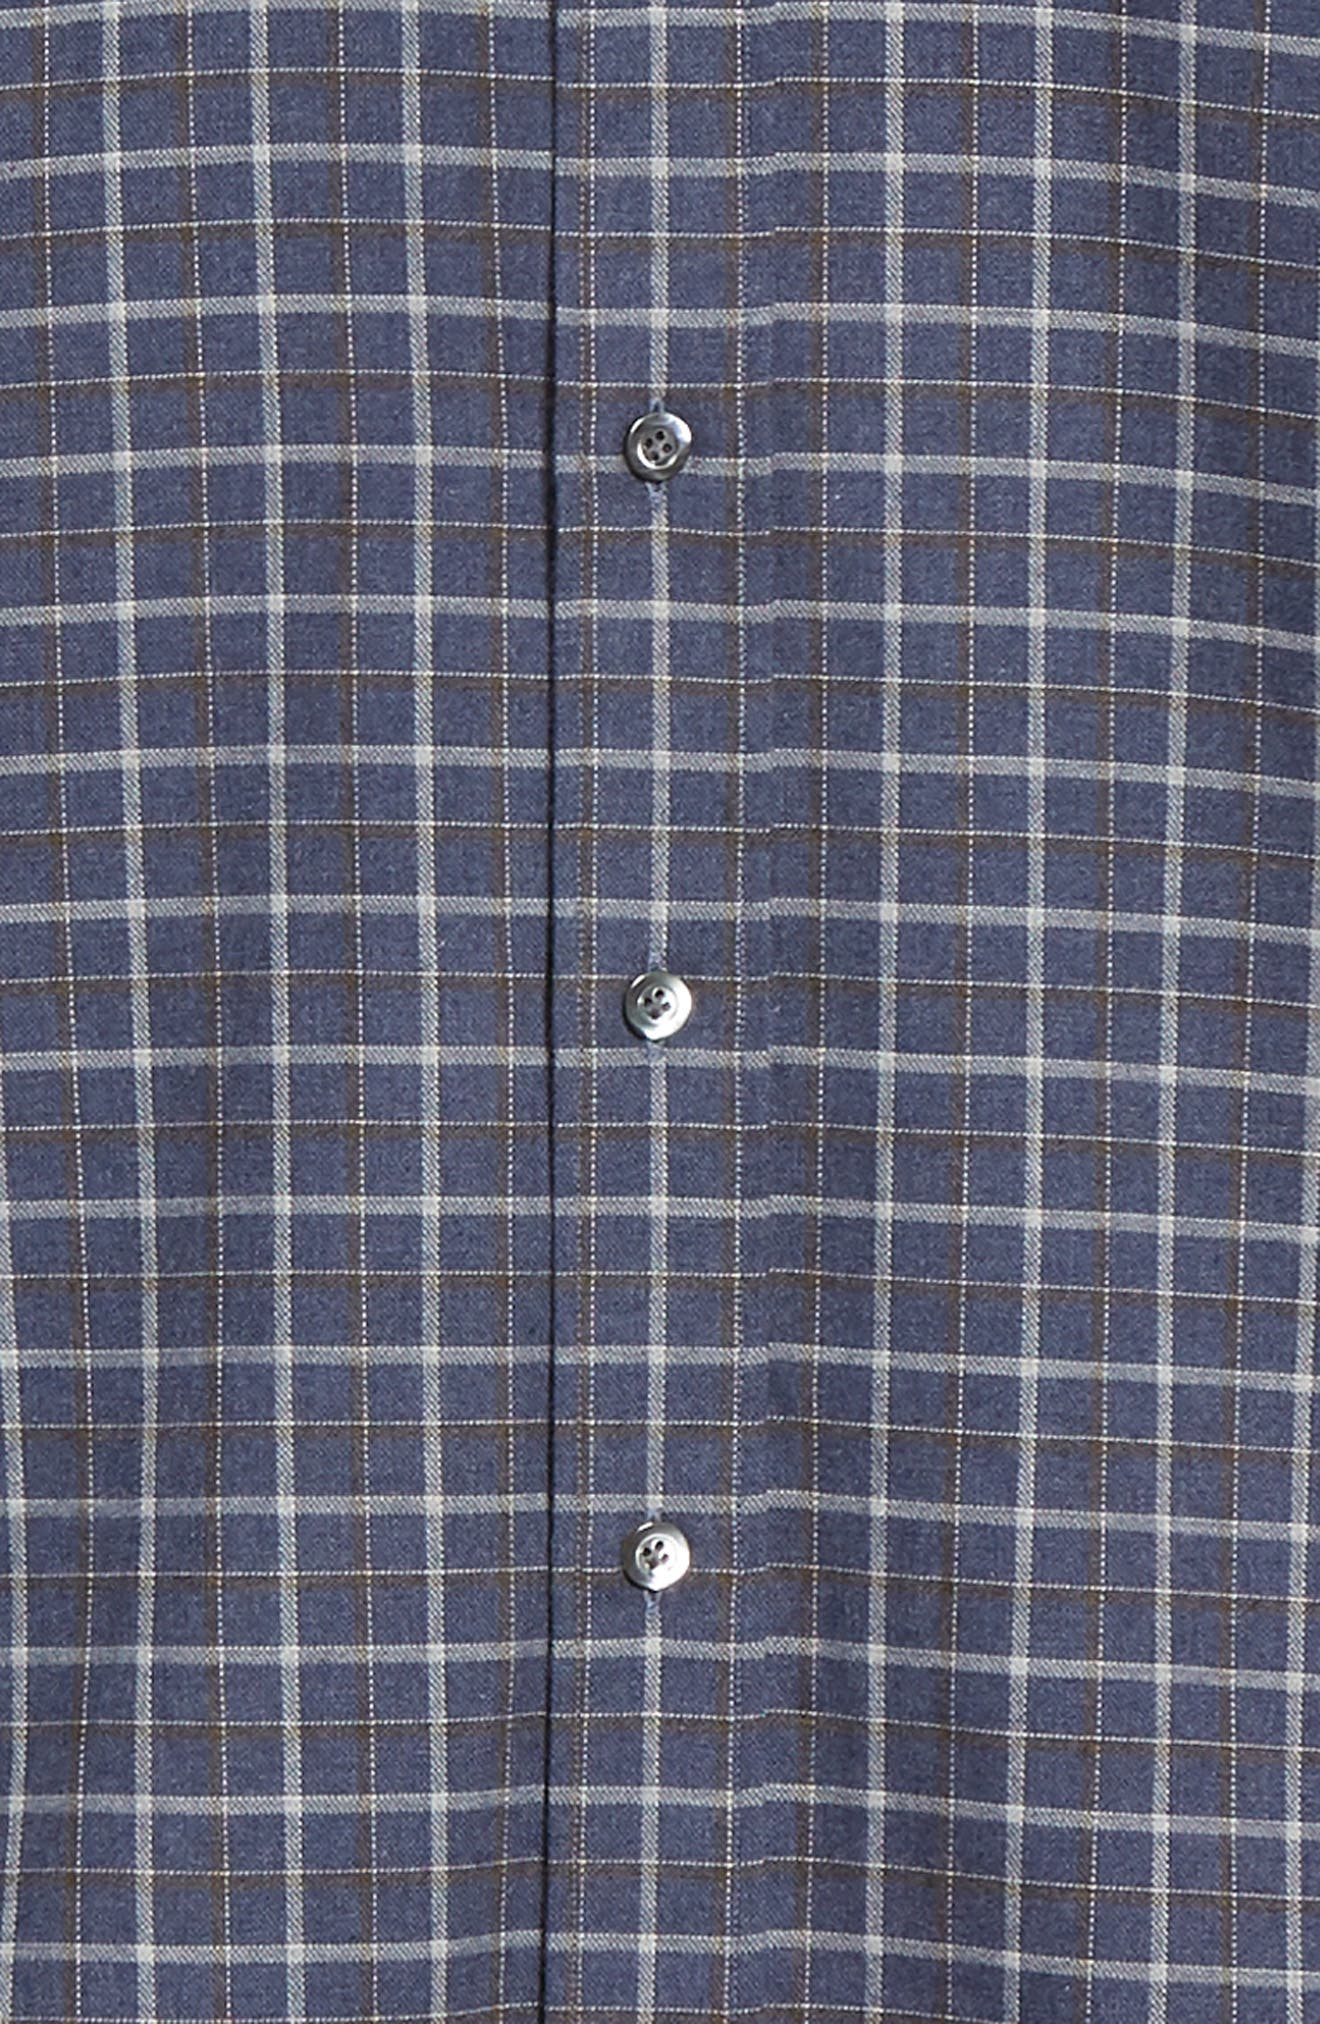 Slim Fit Check Dress Shirt,                             Alternate thumbnail 6, color,                             NAVY